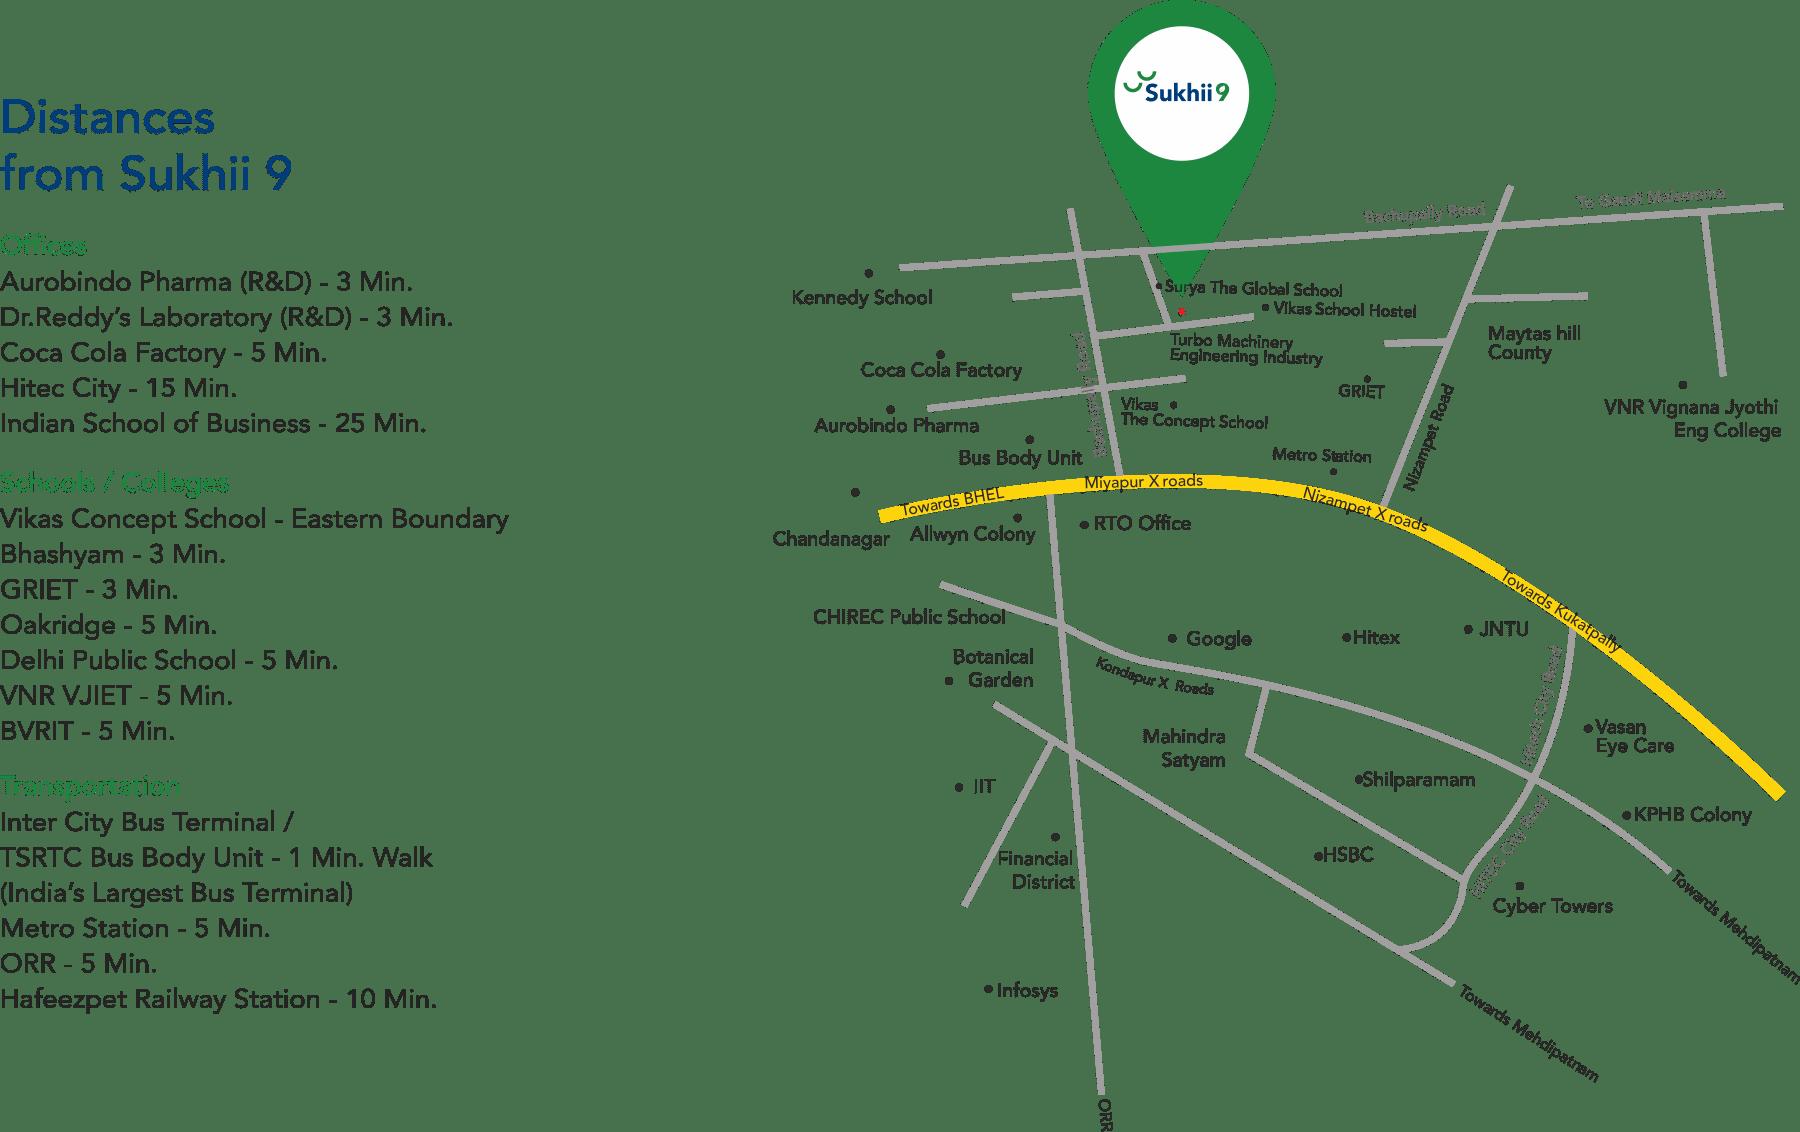 Sukhii9 landmarks